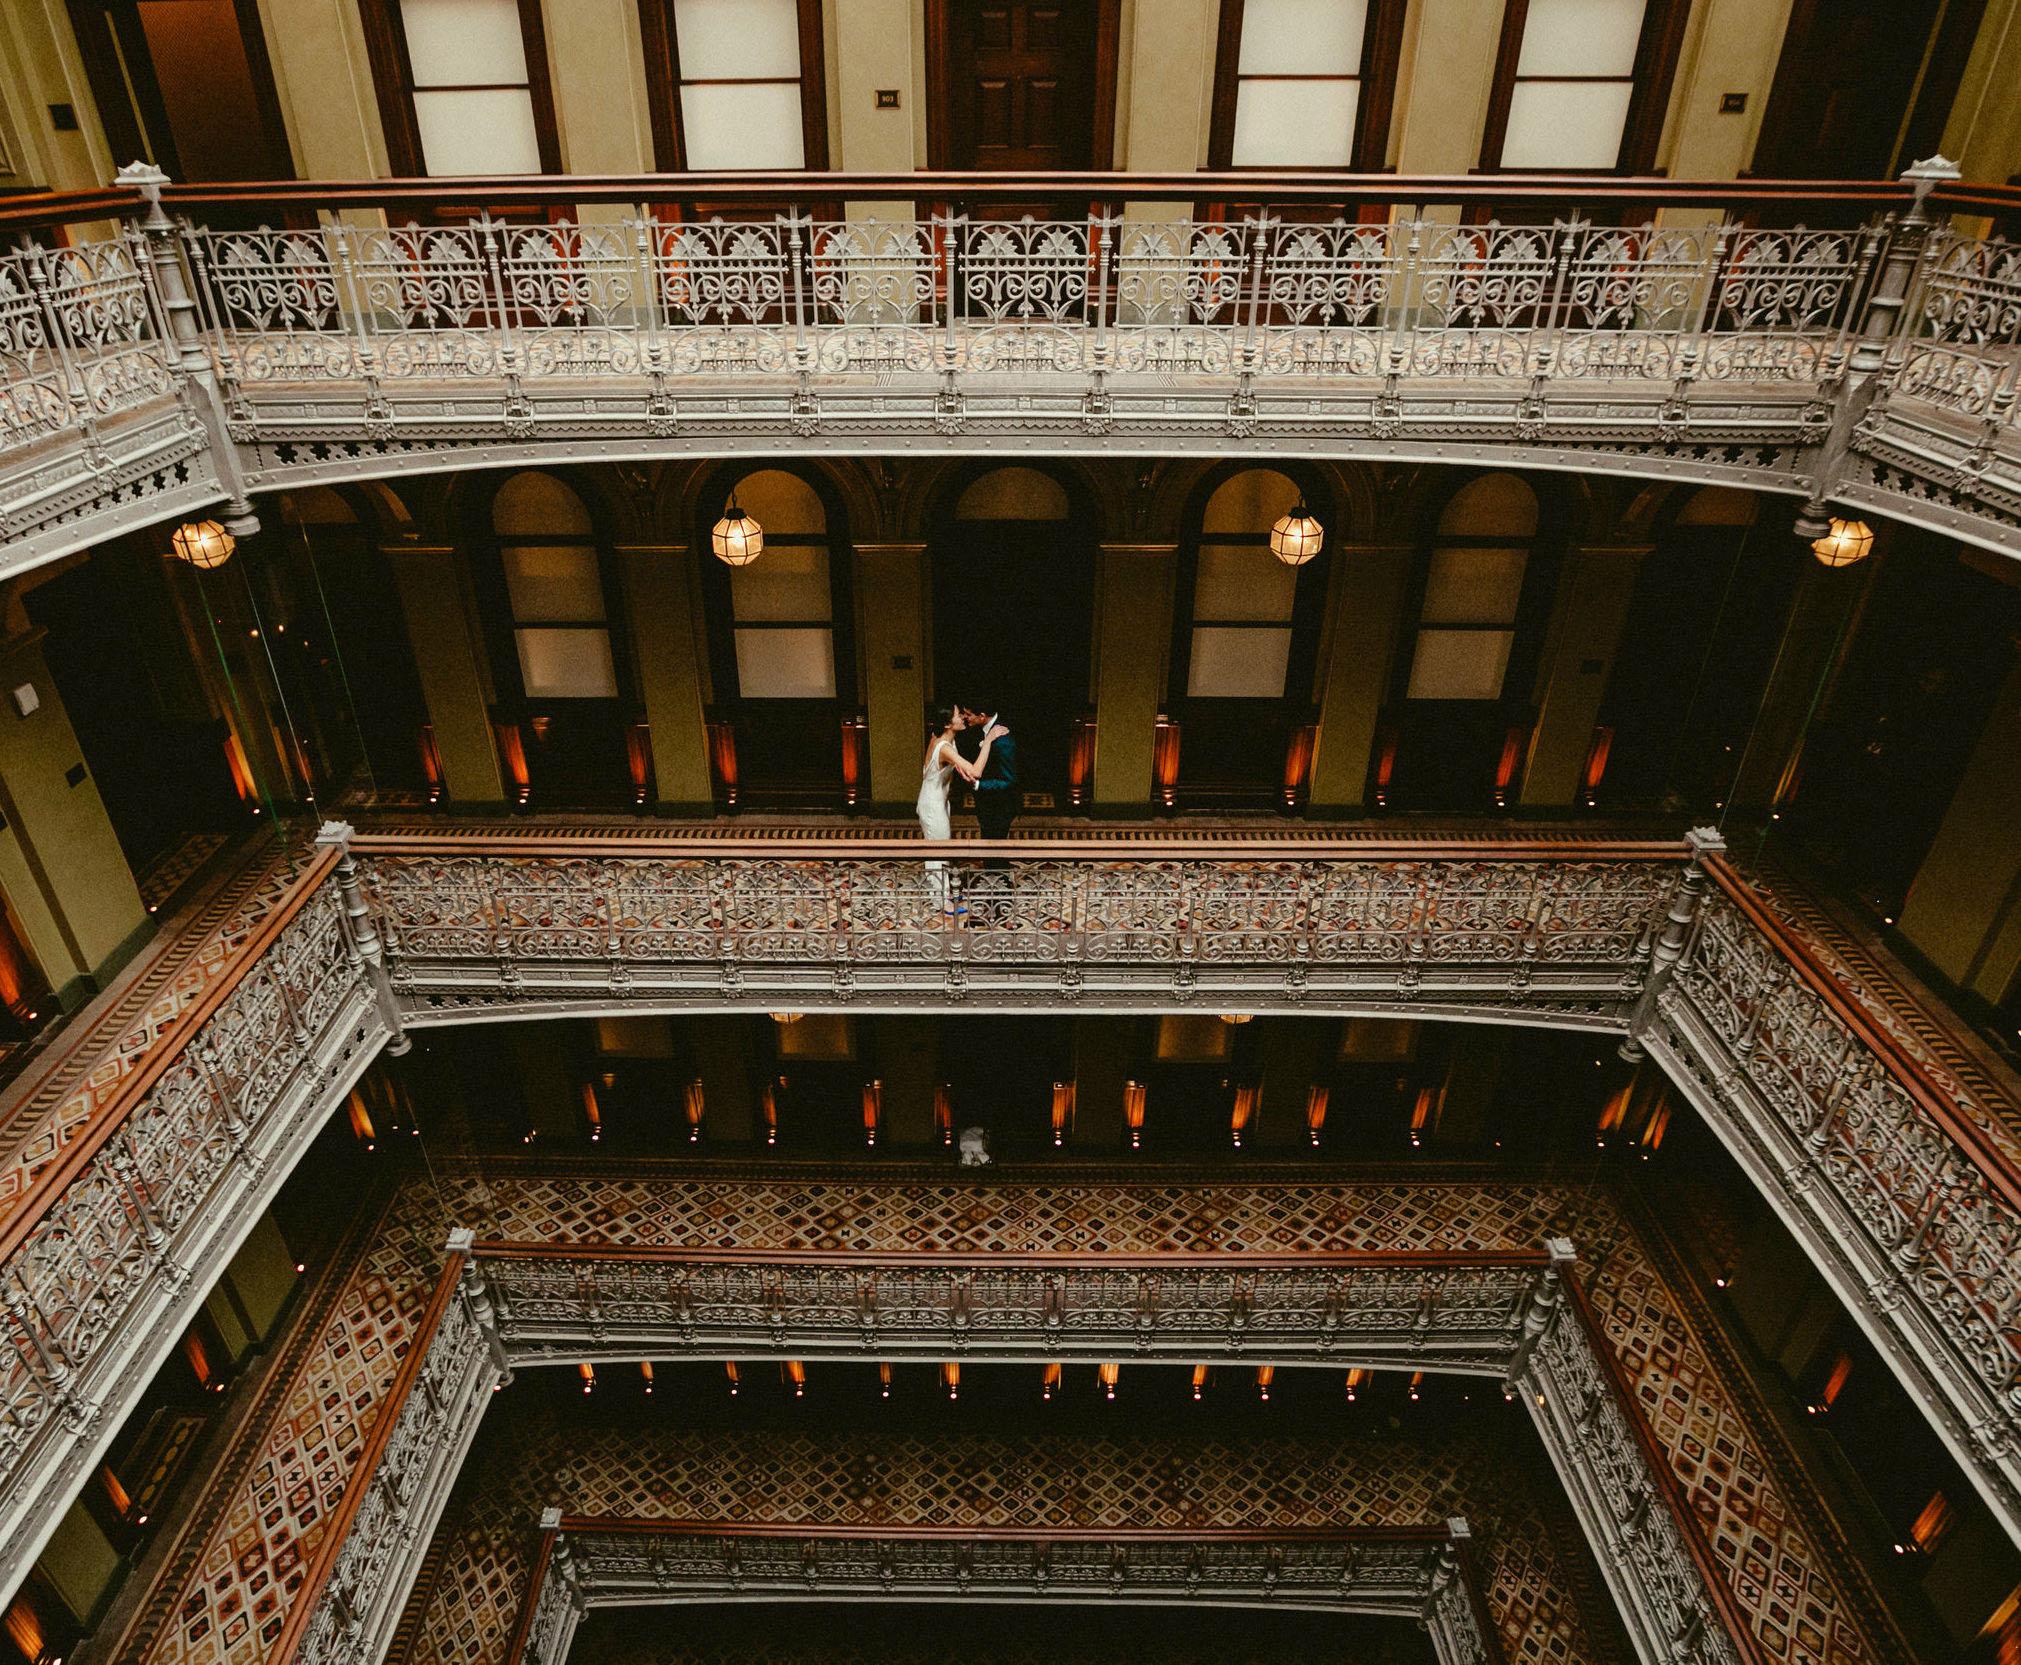 Luxurious suites nine-story atrium